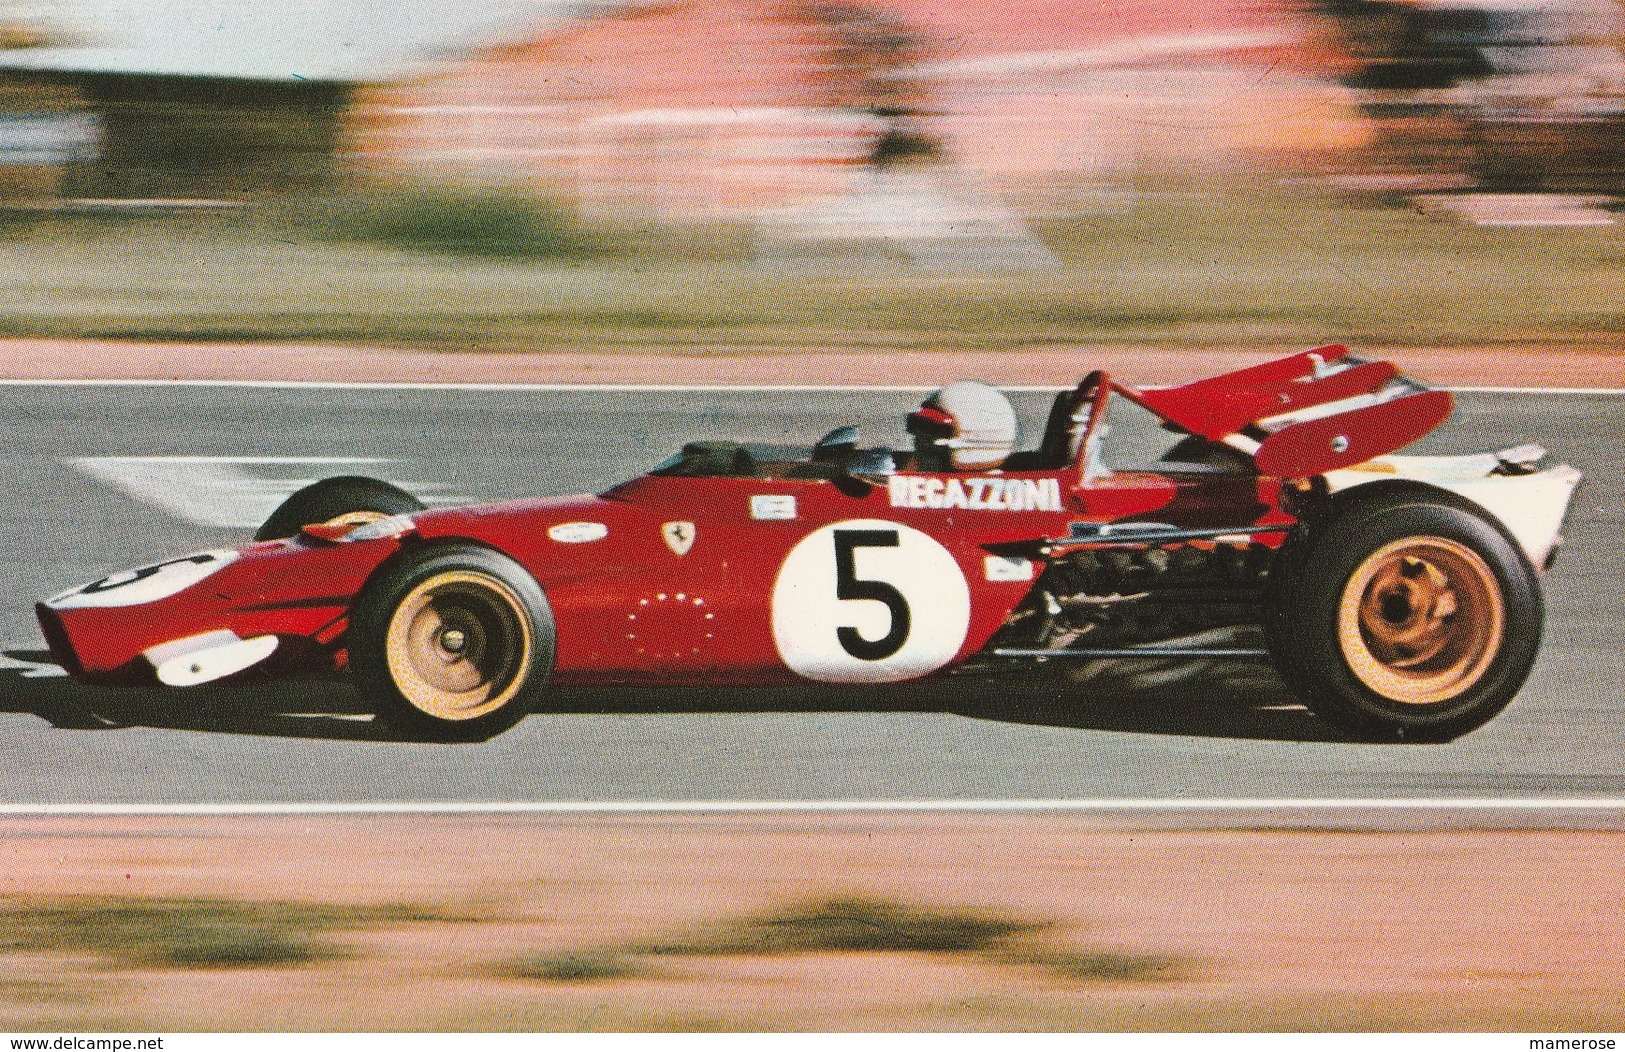 FERRARI 312 B-1 - FERRARI  S.E.F.A.C. (Clay Regazzoni) N°5. Motor: FERRARI BOXER - Sport Automobile